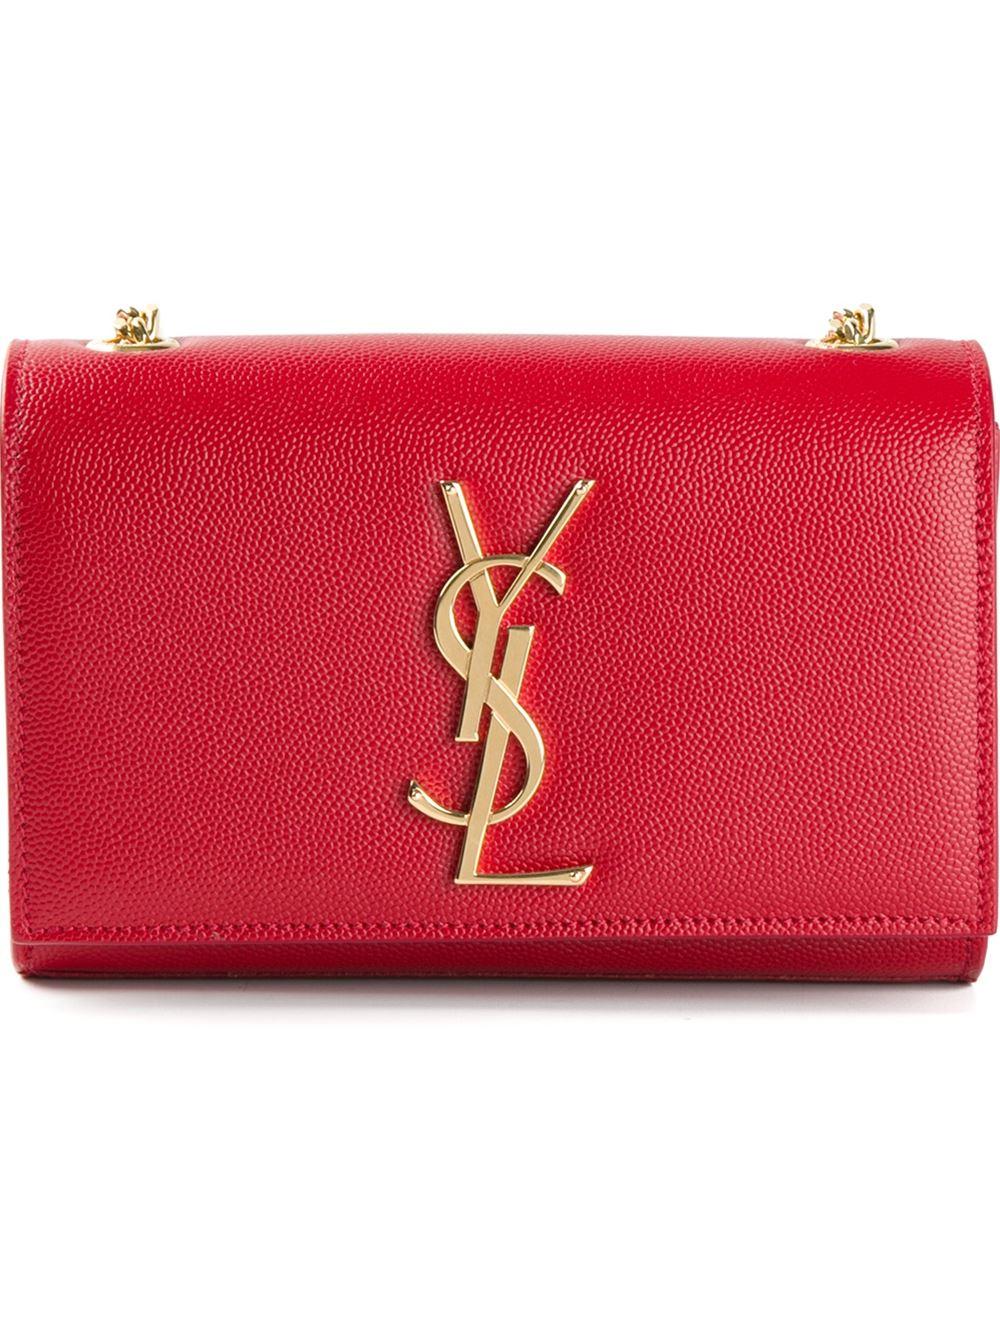 monogram small crossbody bag  red  yves saint laurent cabas chyc tote bag large